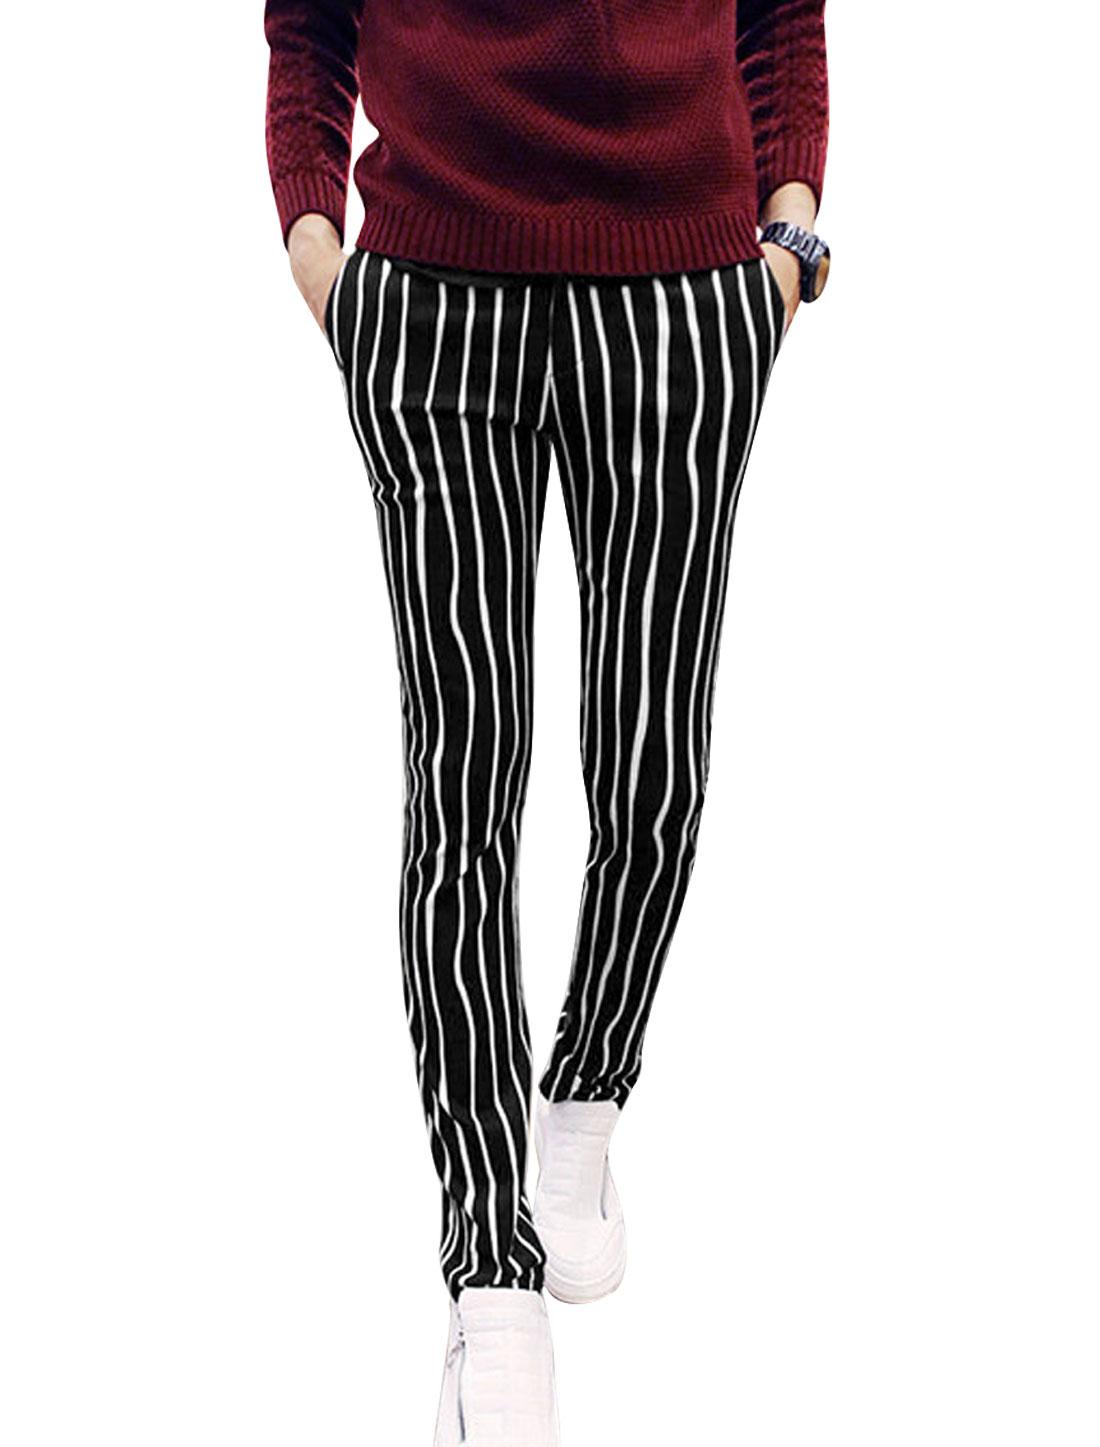 Men Stripes Belt Loop Zip Fly Slant Pockets Slim Casual Pants Black White W30